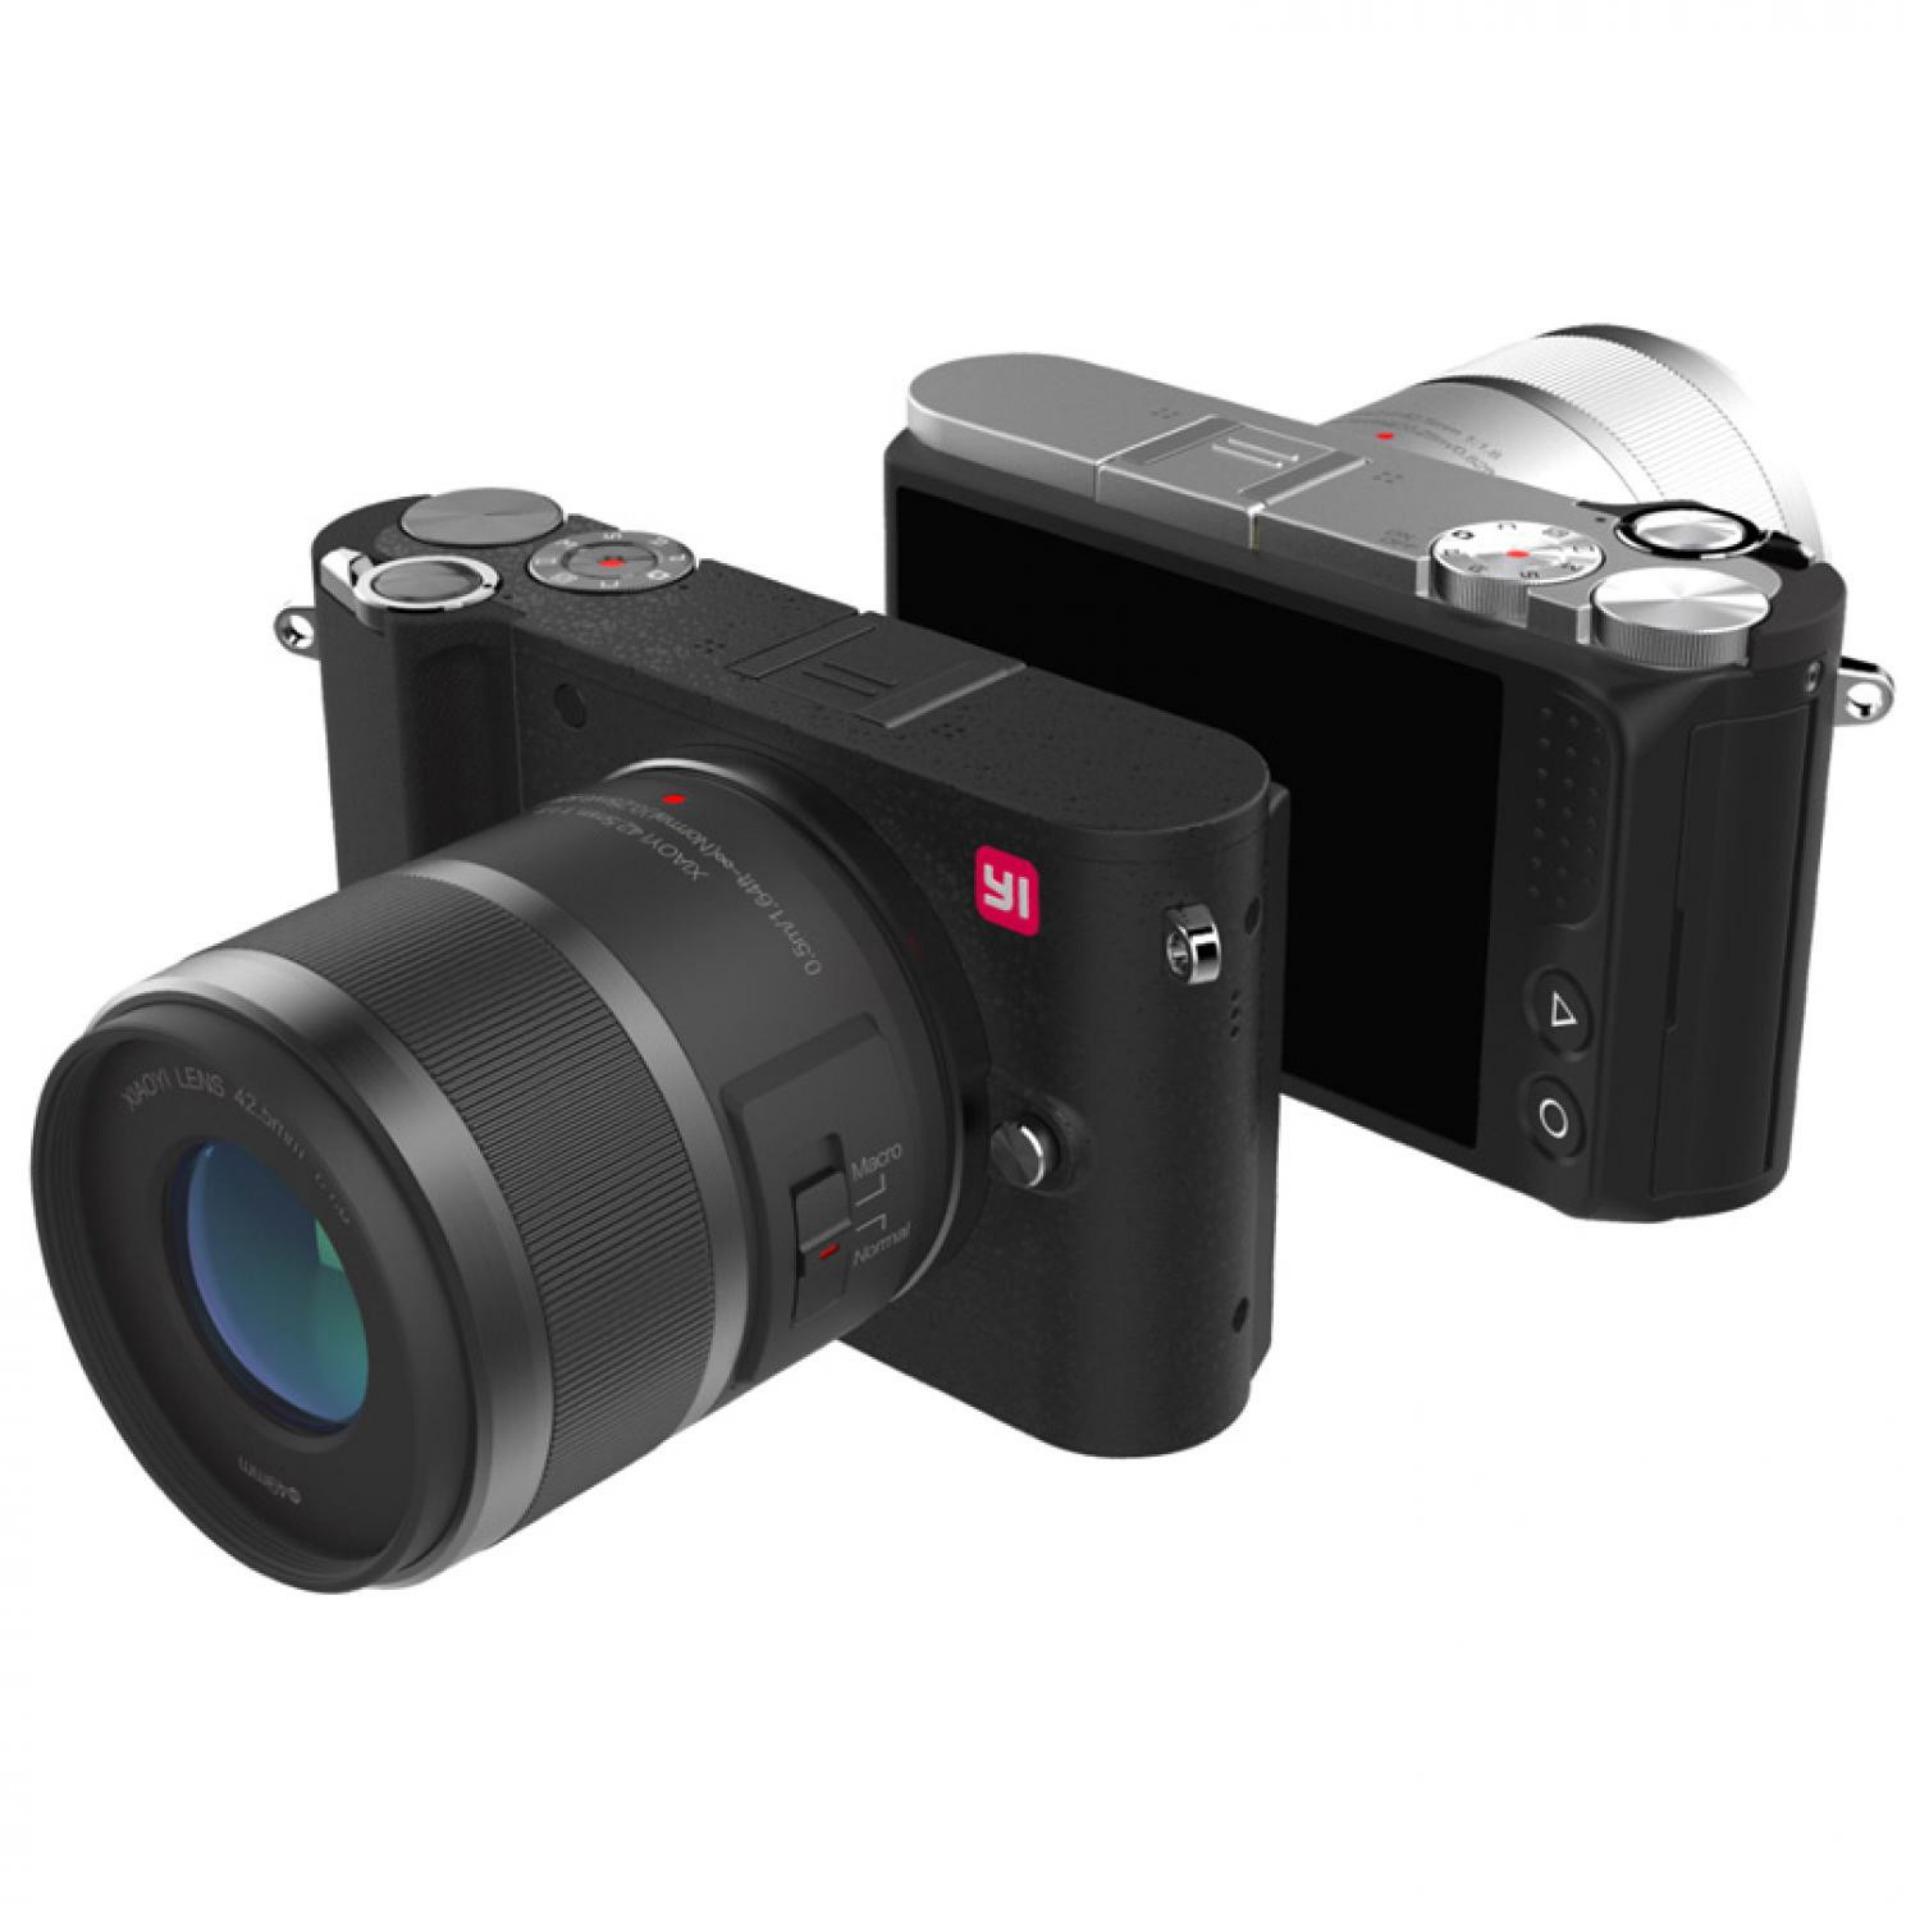 ... Xiaomi Yi M1 Mirrorless Digital Camera 12-40mm F3.5-5.6 Lens &42 ...